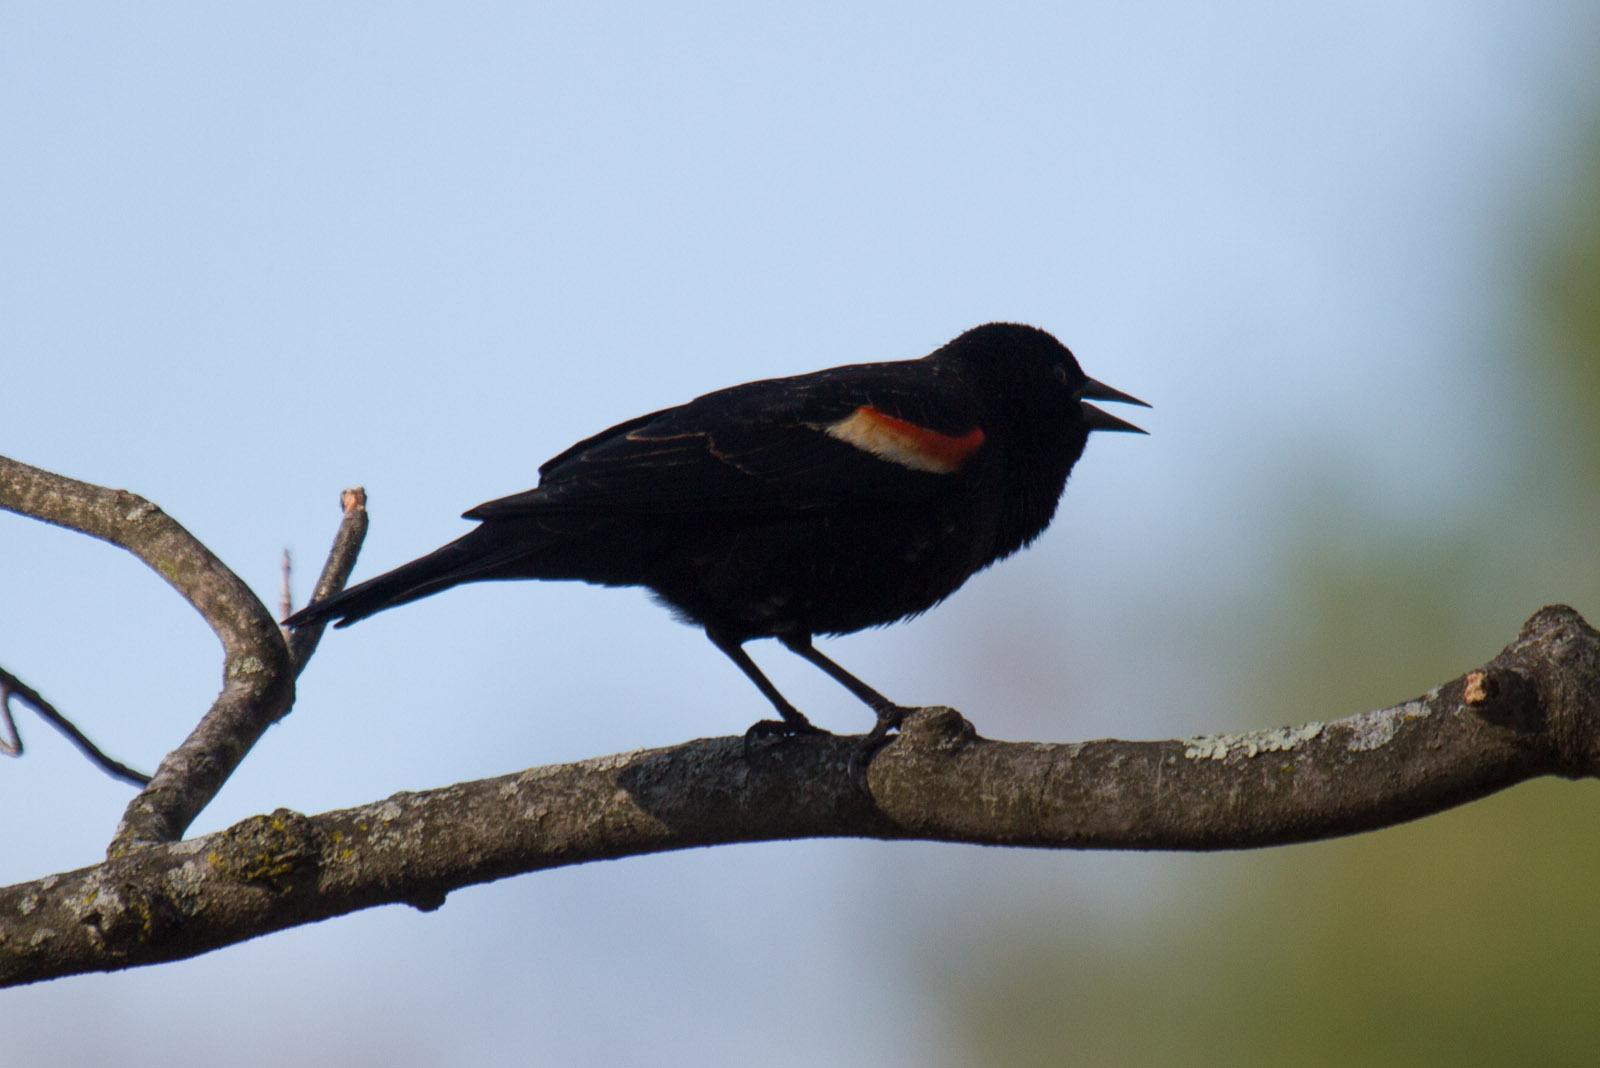 Image of Red-winged Blackbird